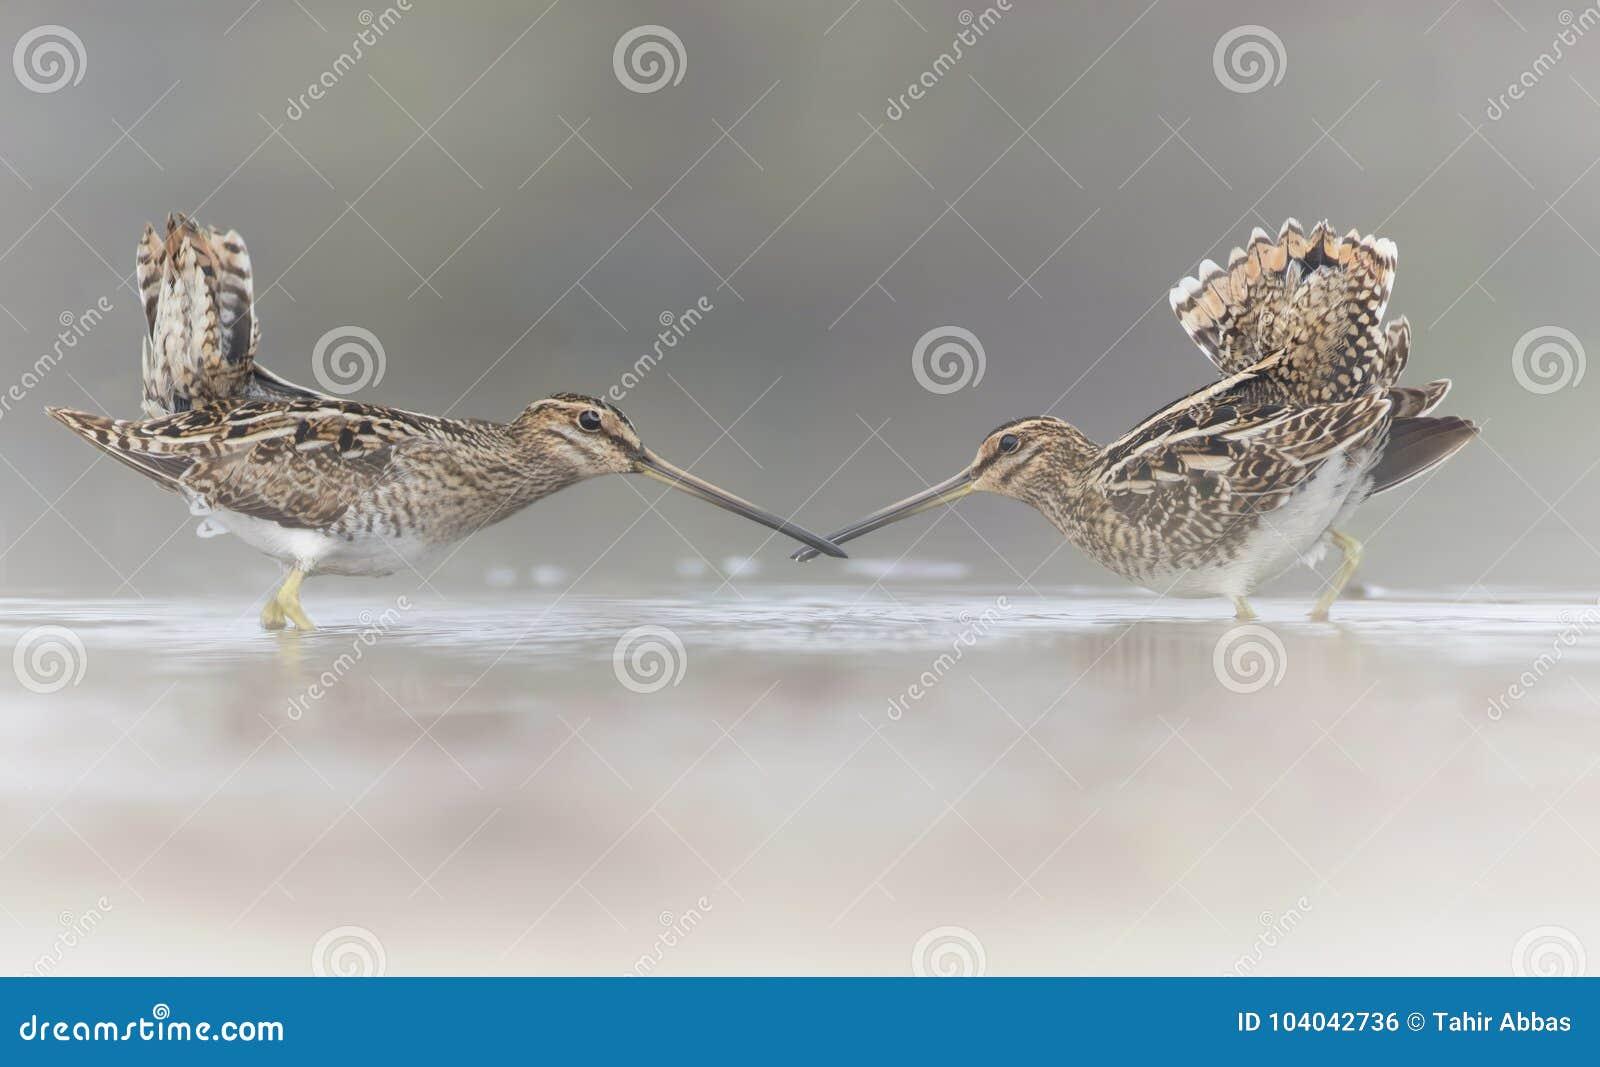 Pair of Common Snipe in love